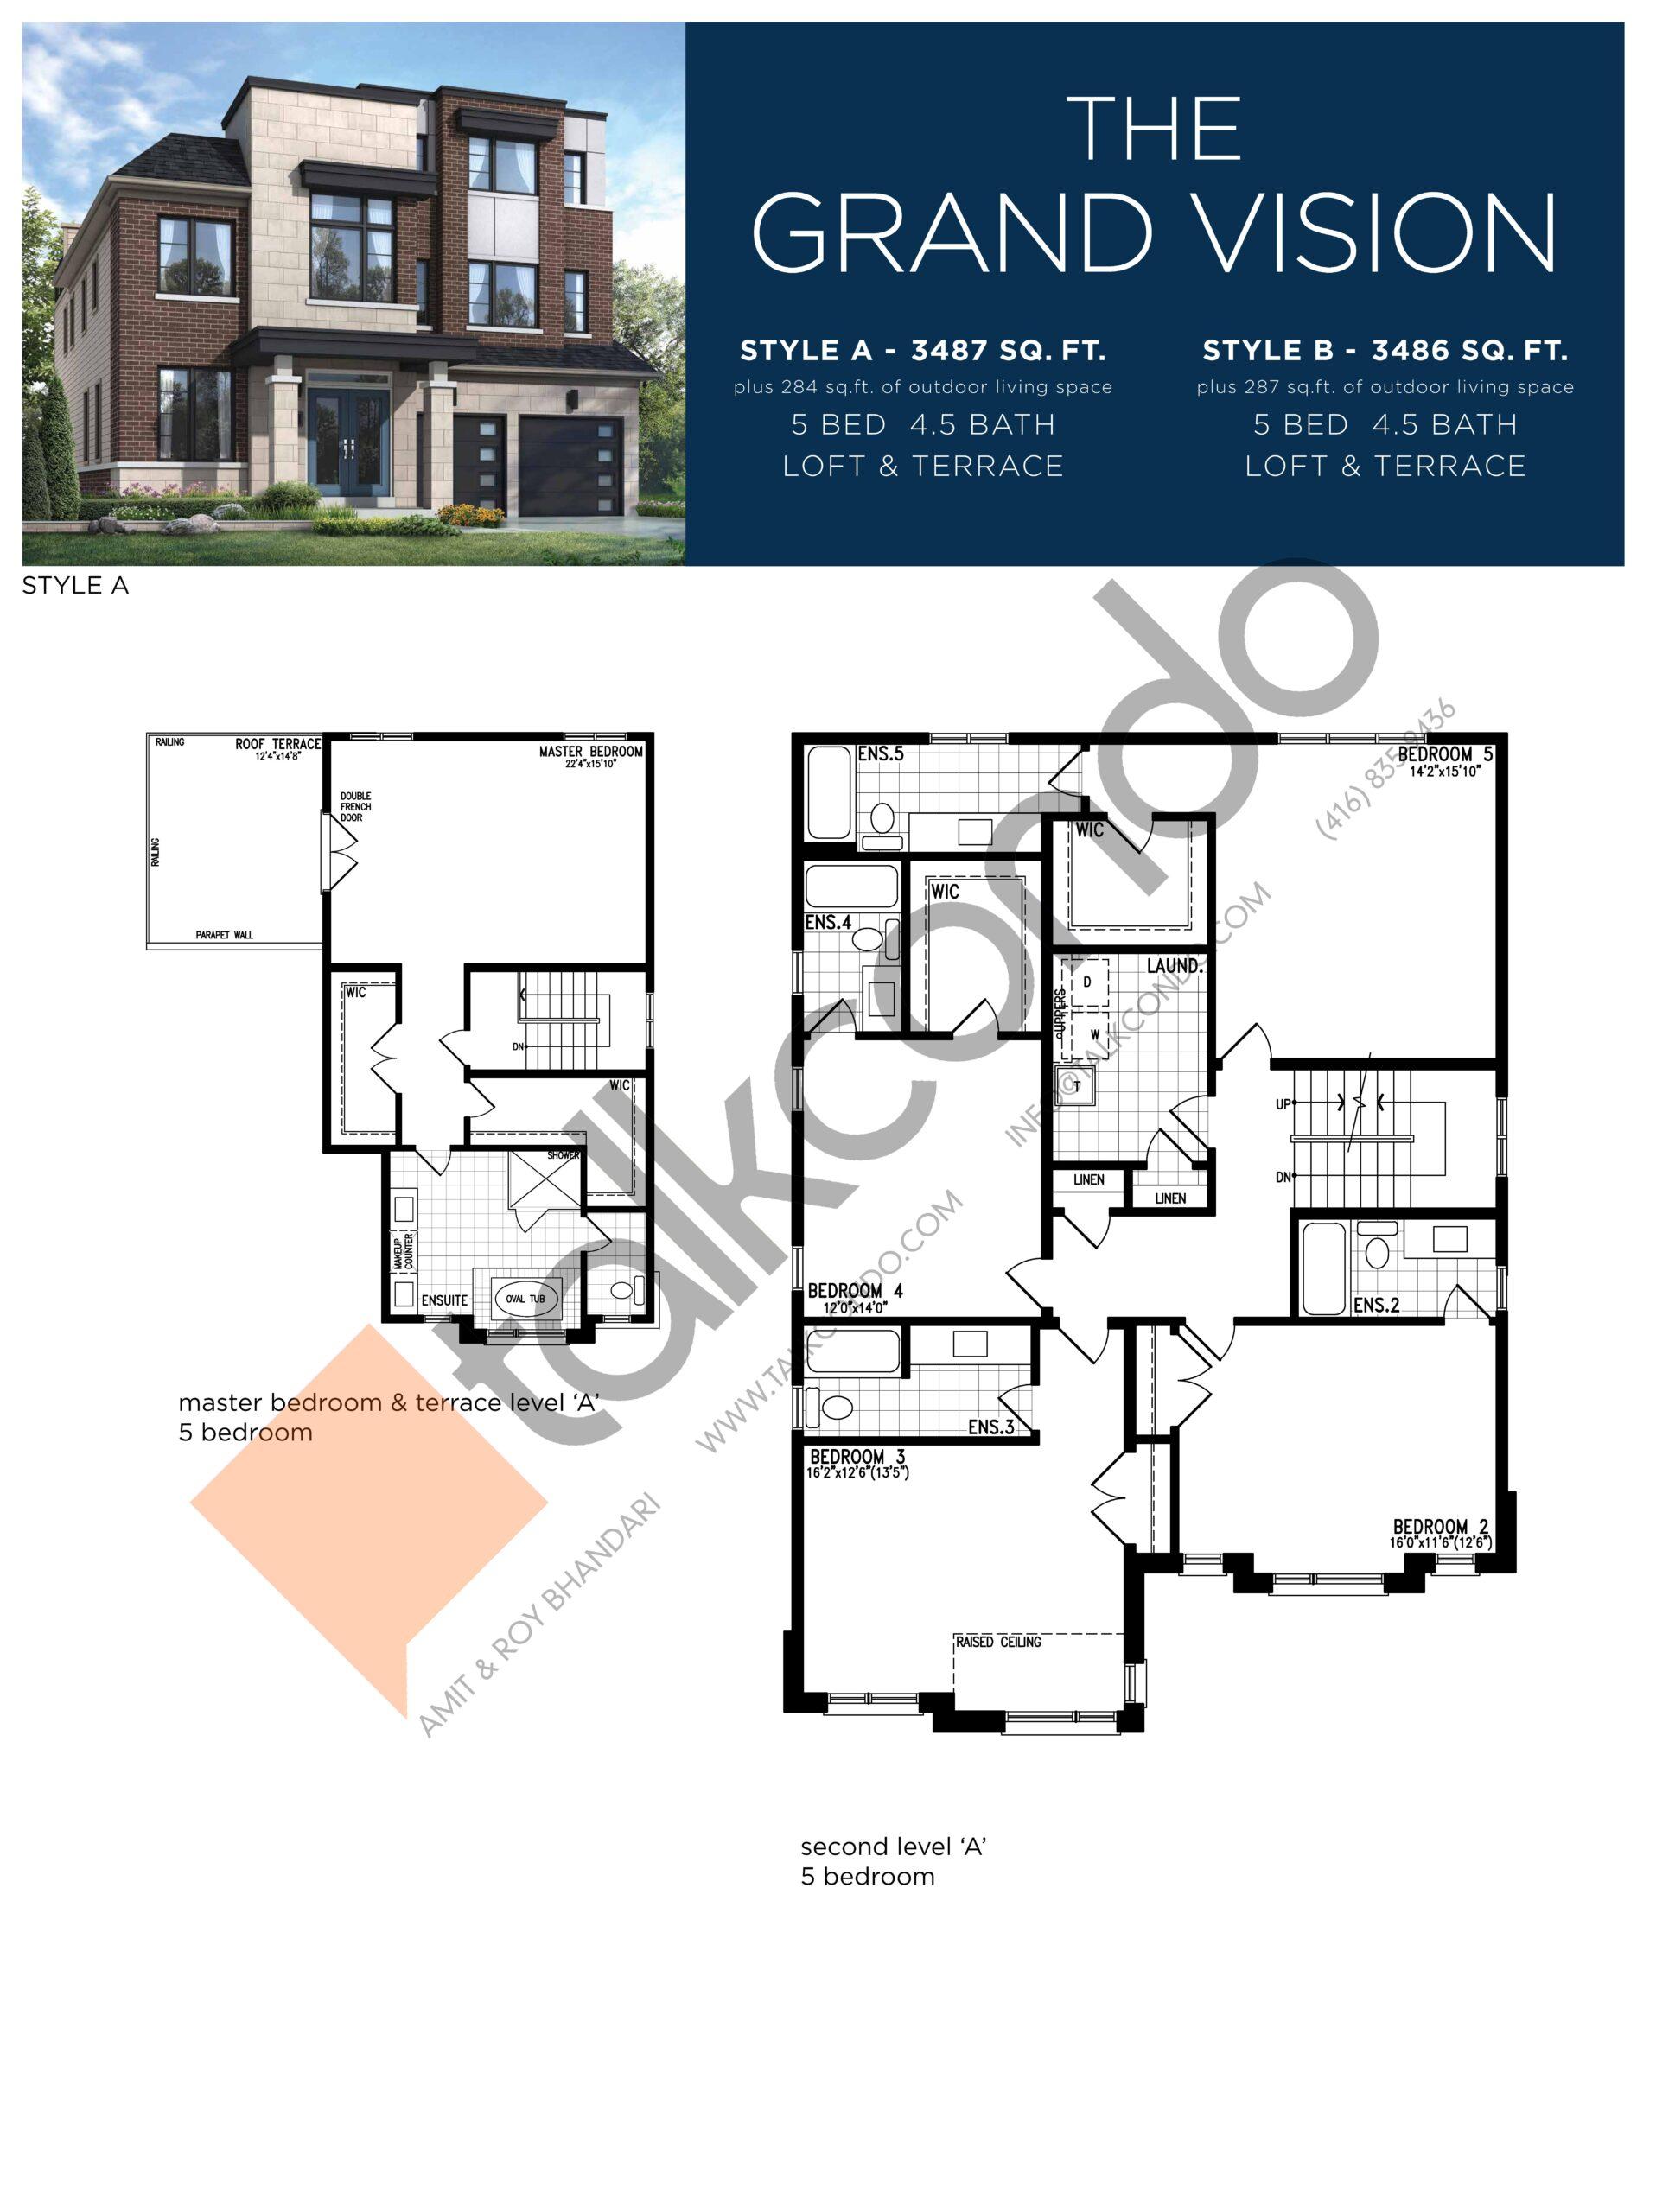 The Grand Vision (3/3) Floor Plan at Lake Breeze - 3487 sq.ft